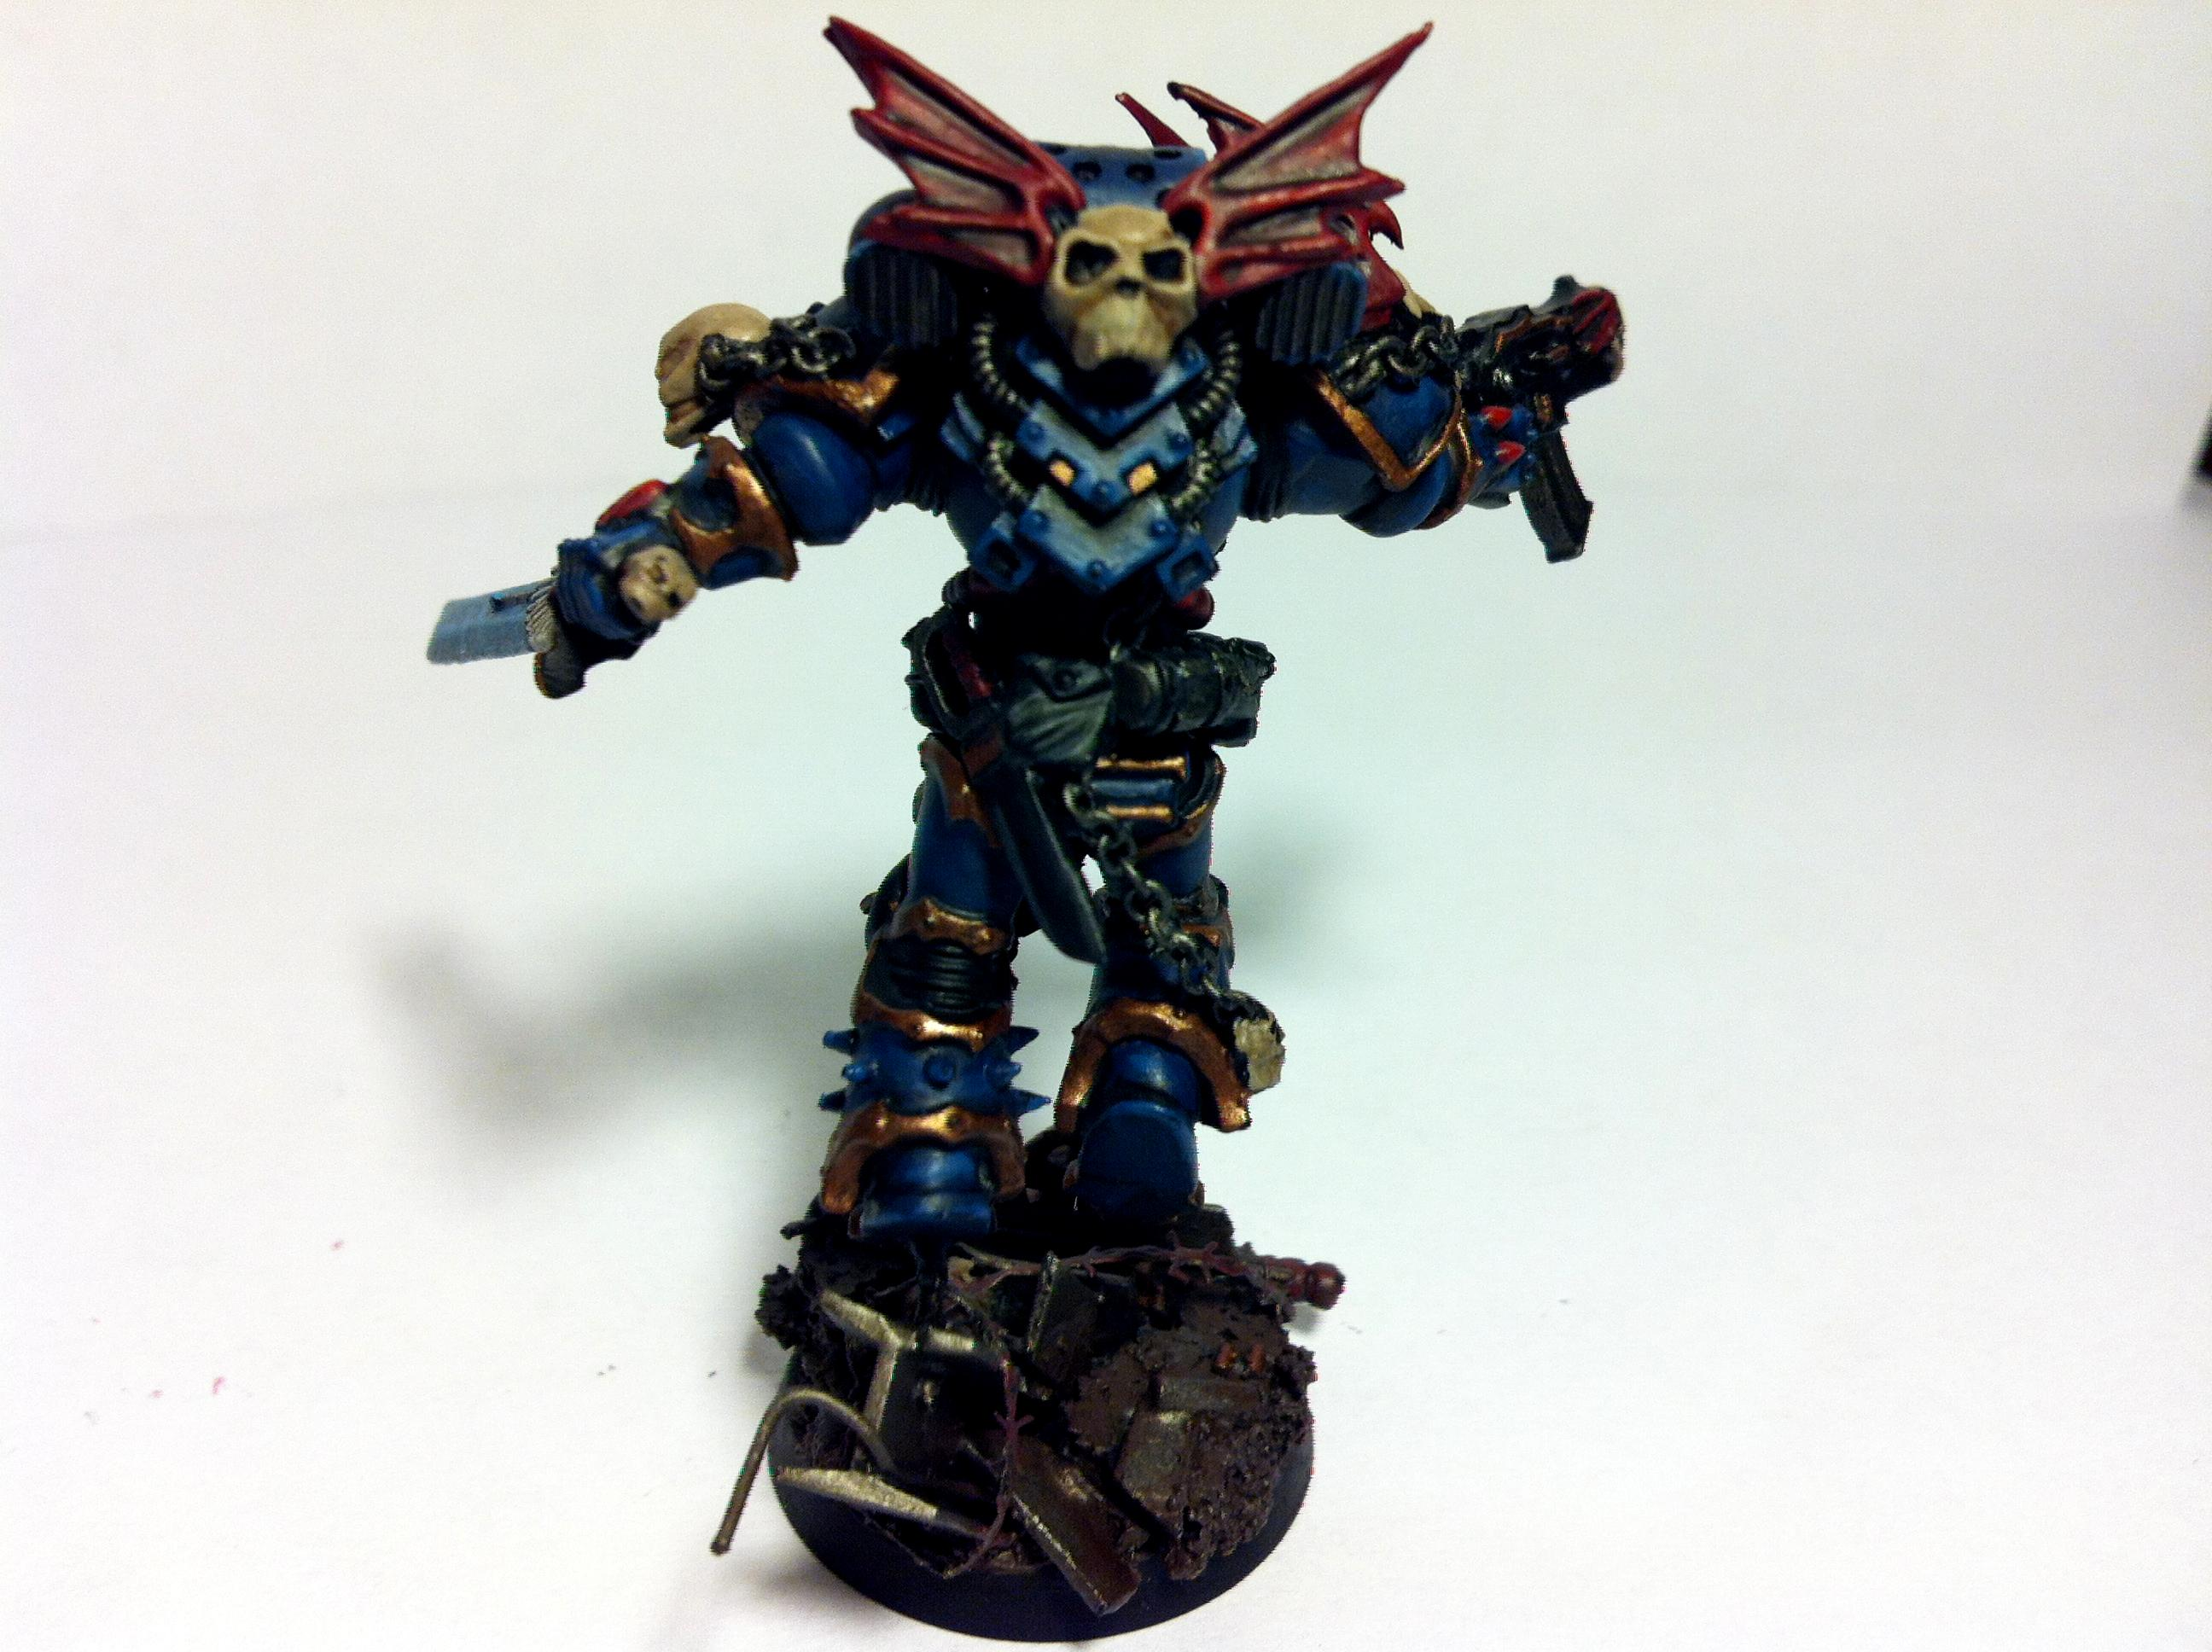 Chaos, Custom, Nightlords, Talos, Warhammer 40,000